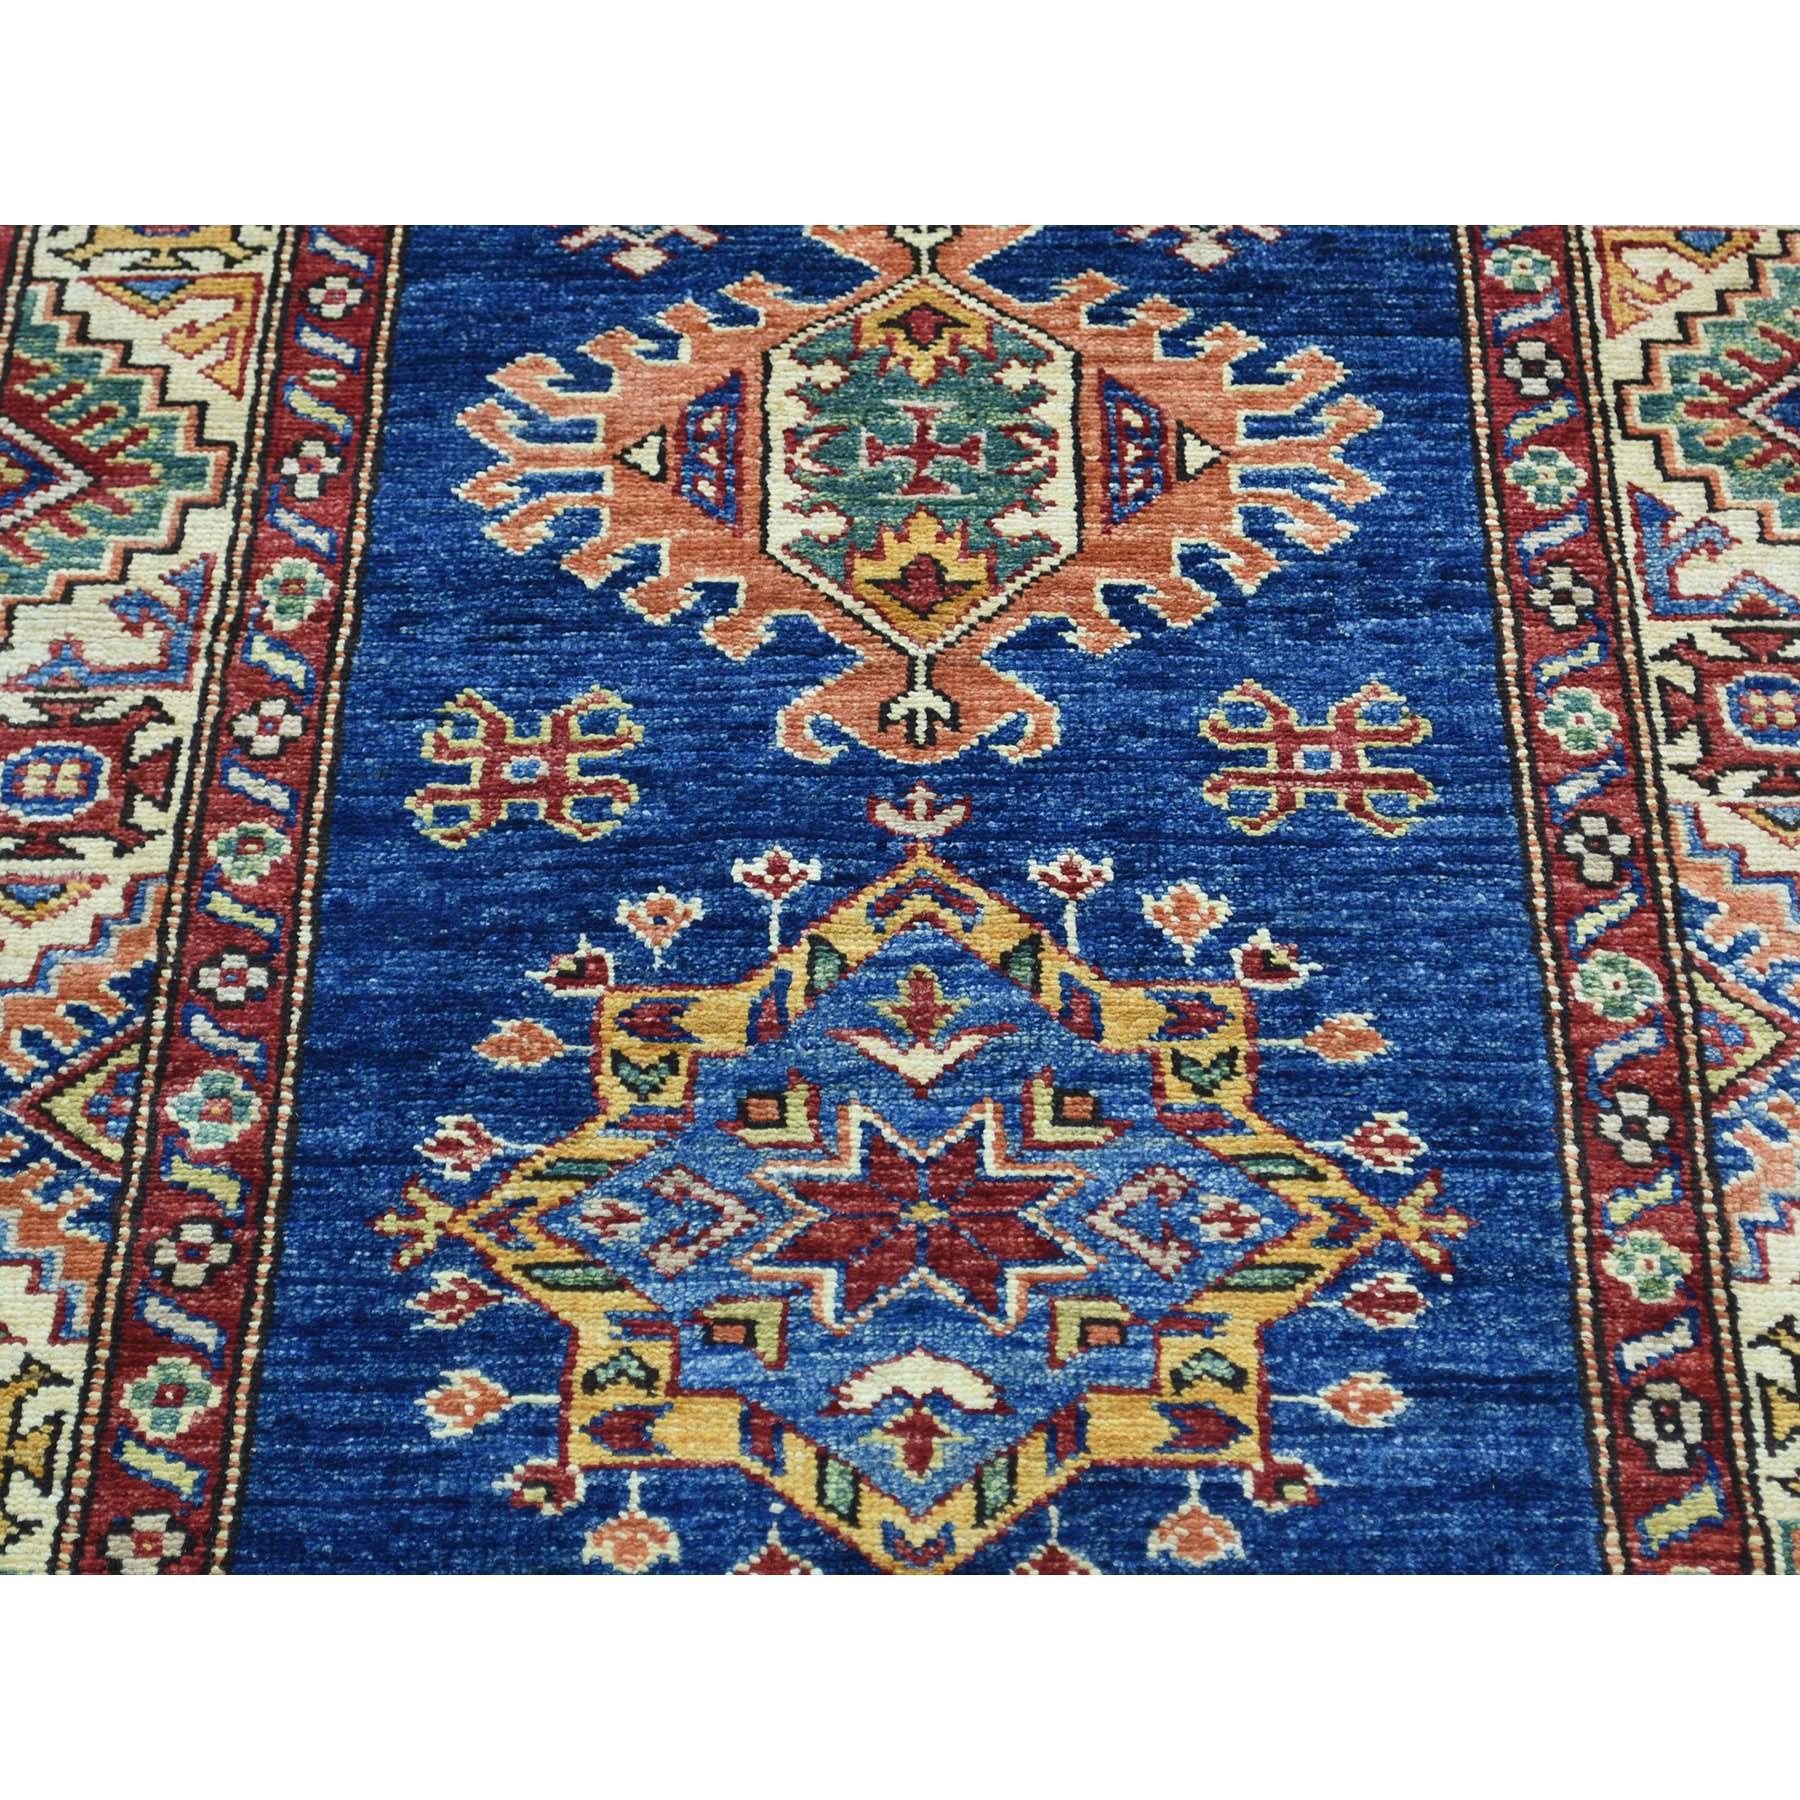 "2'9""x17'4"" Hand-Knotted Super Kazak XL Runner Tribal Design Oriental Rug"